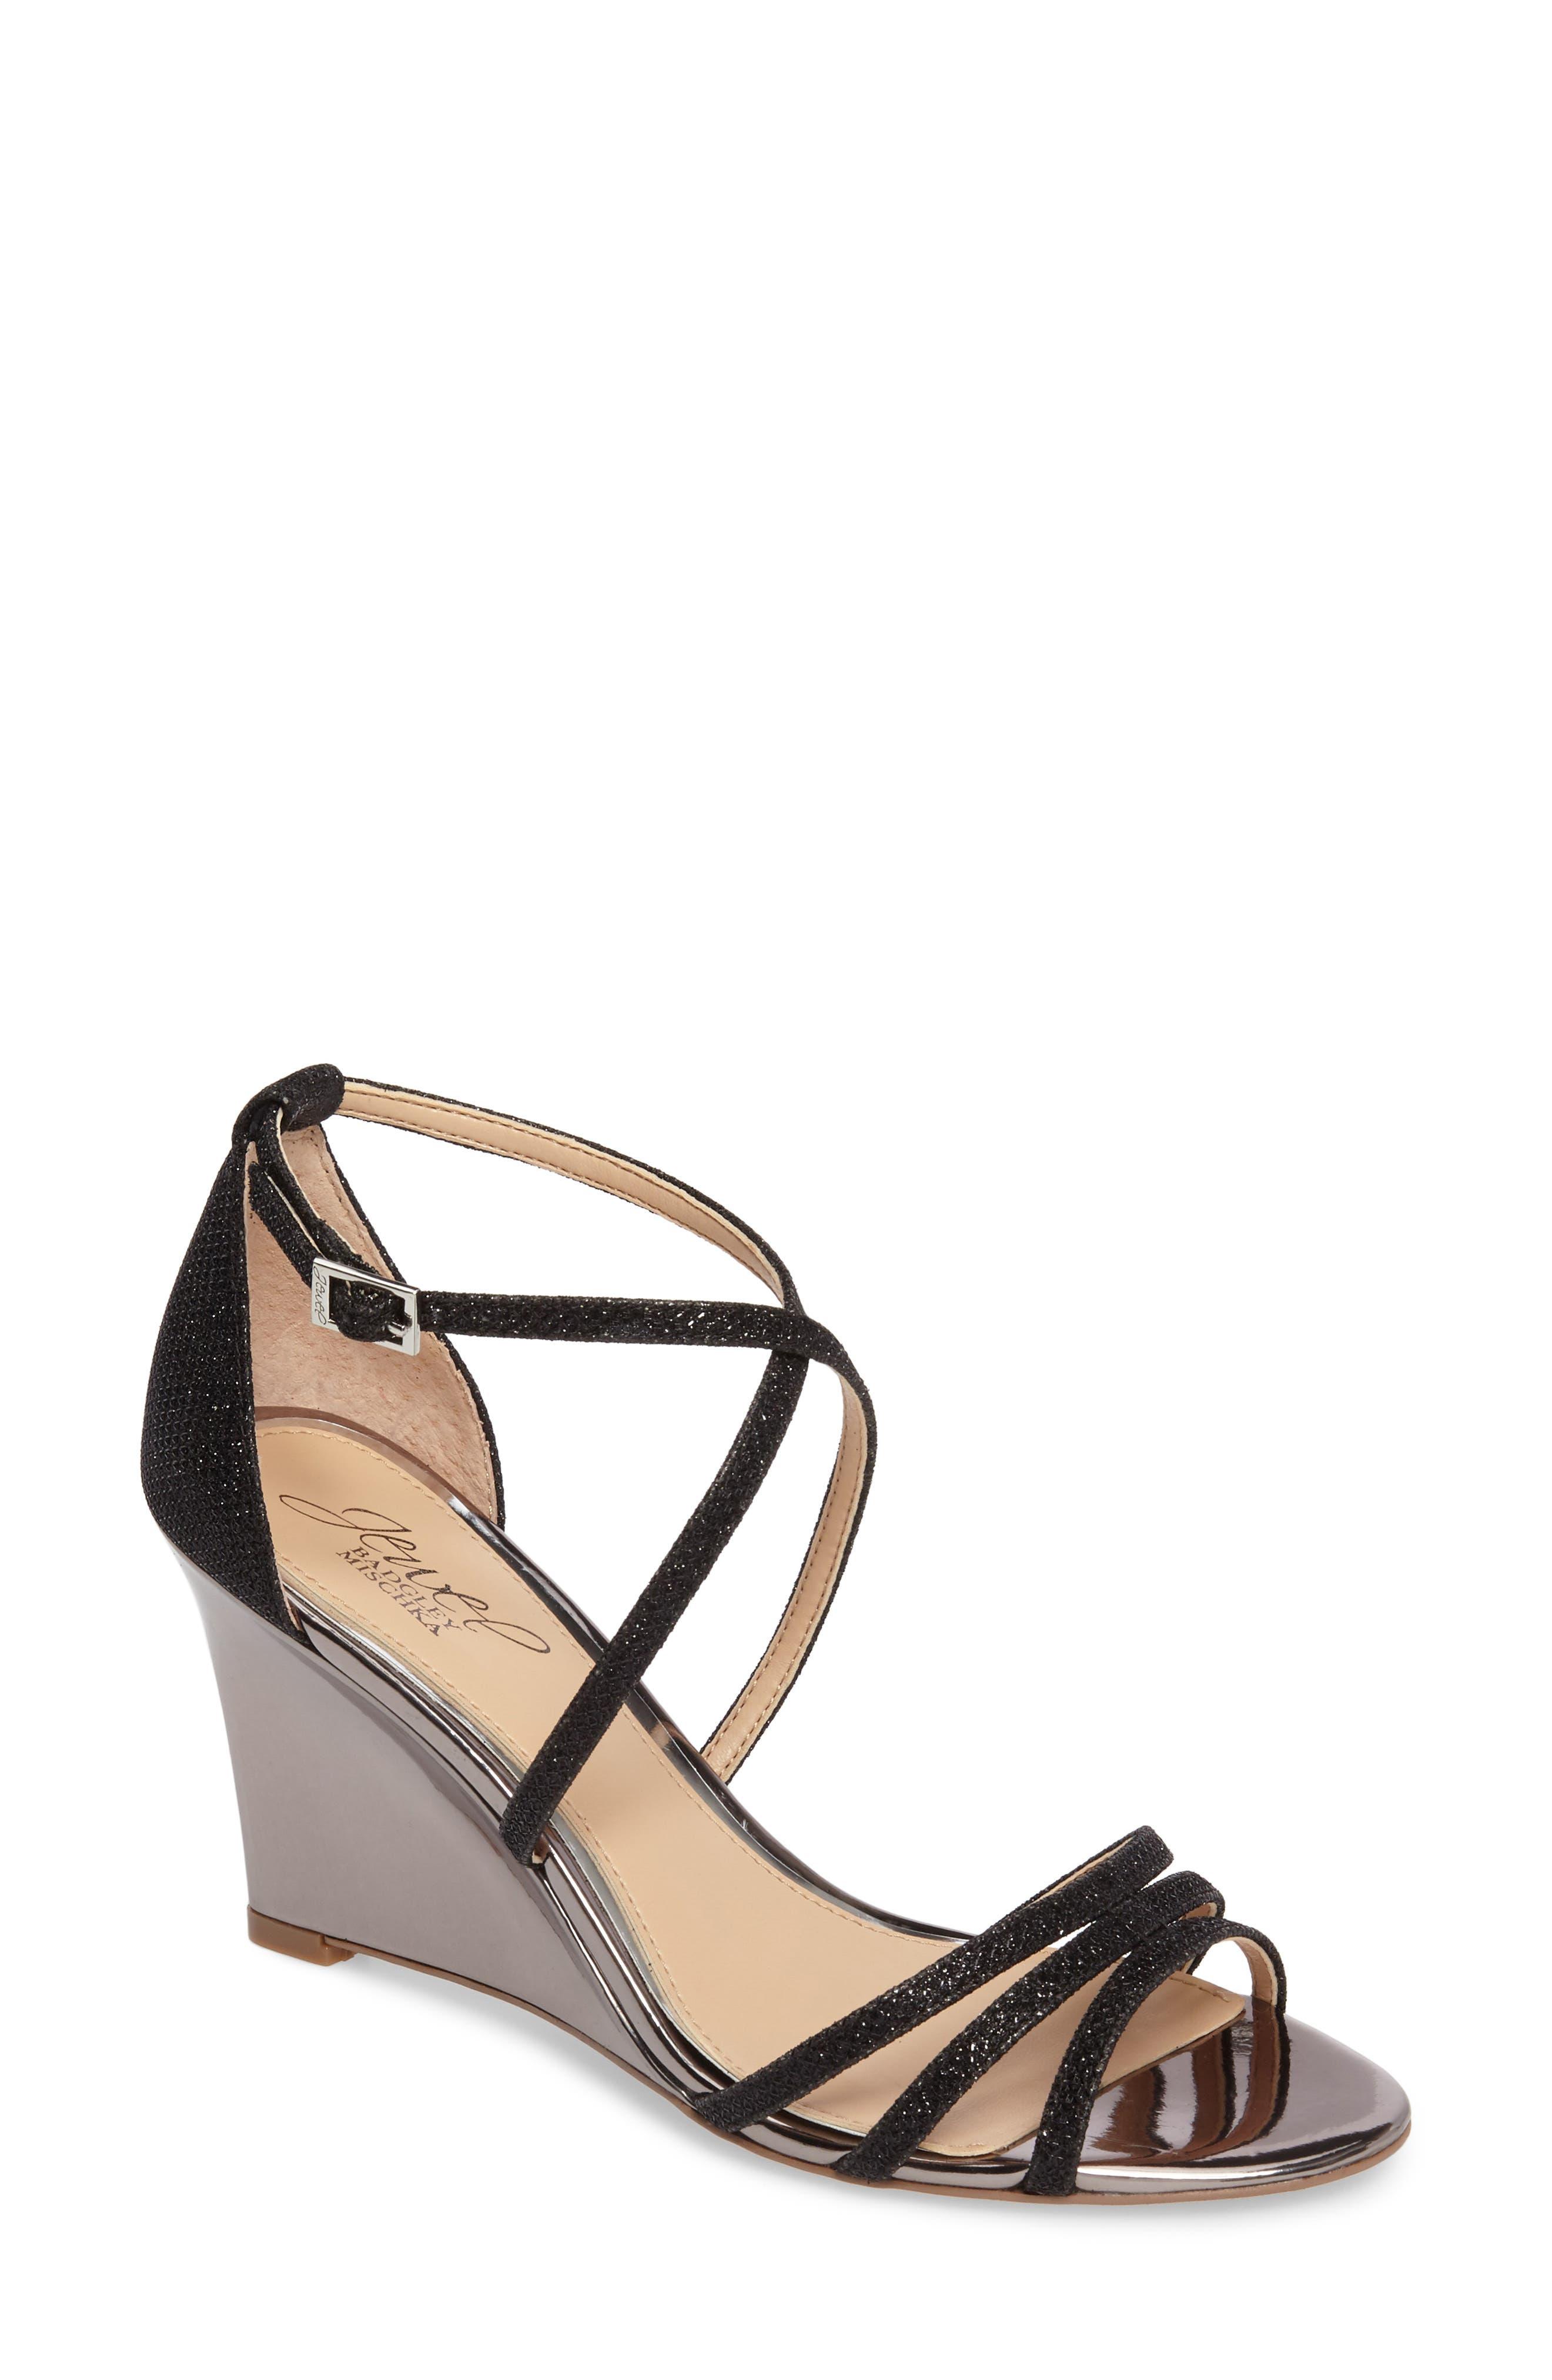 Alternate Image 1 Selected - Jewel Badgley Mischka Hunt Glittery Wedge Sandal (Women)